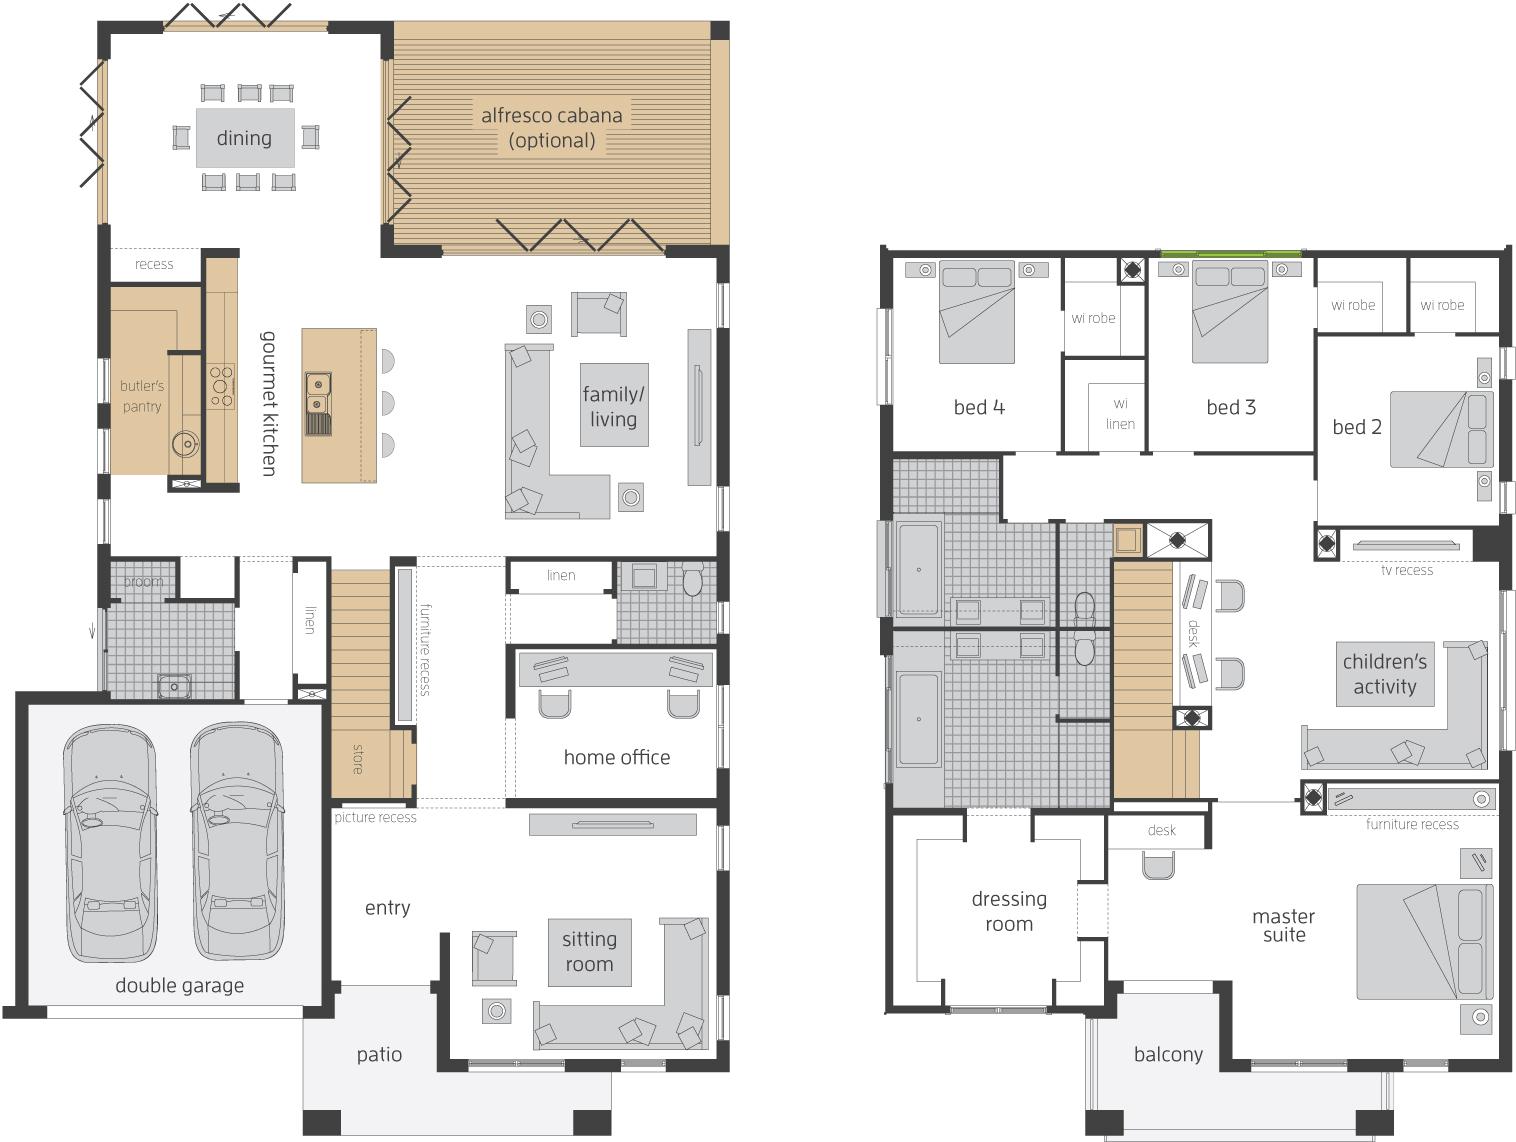 Floor Plan - Tallavera 45 Double Storey Home - McDonald Jones